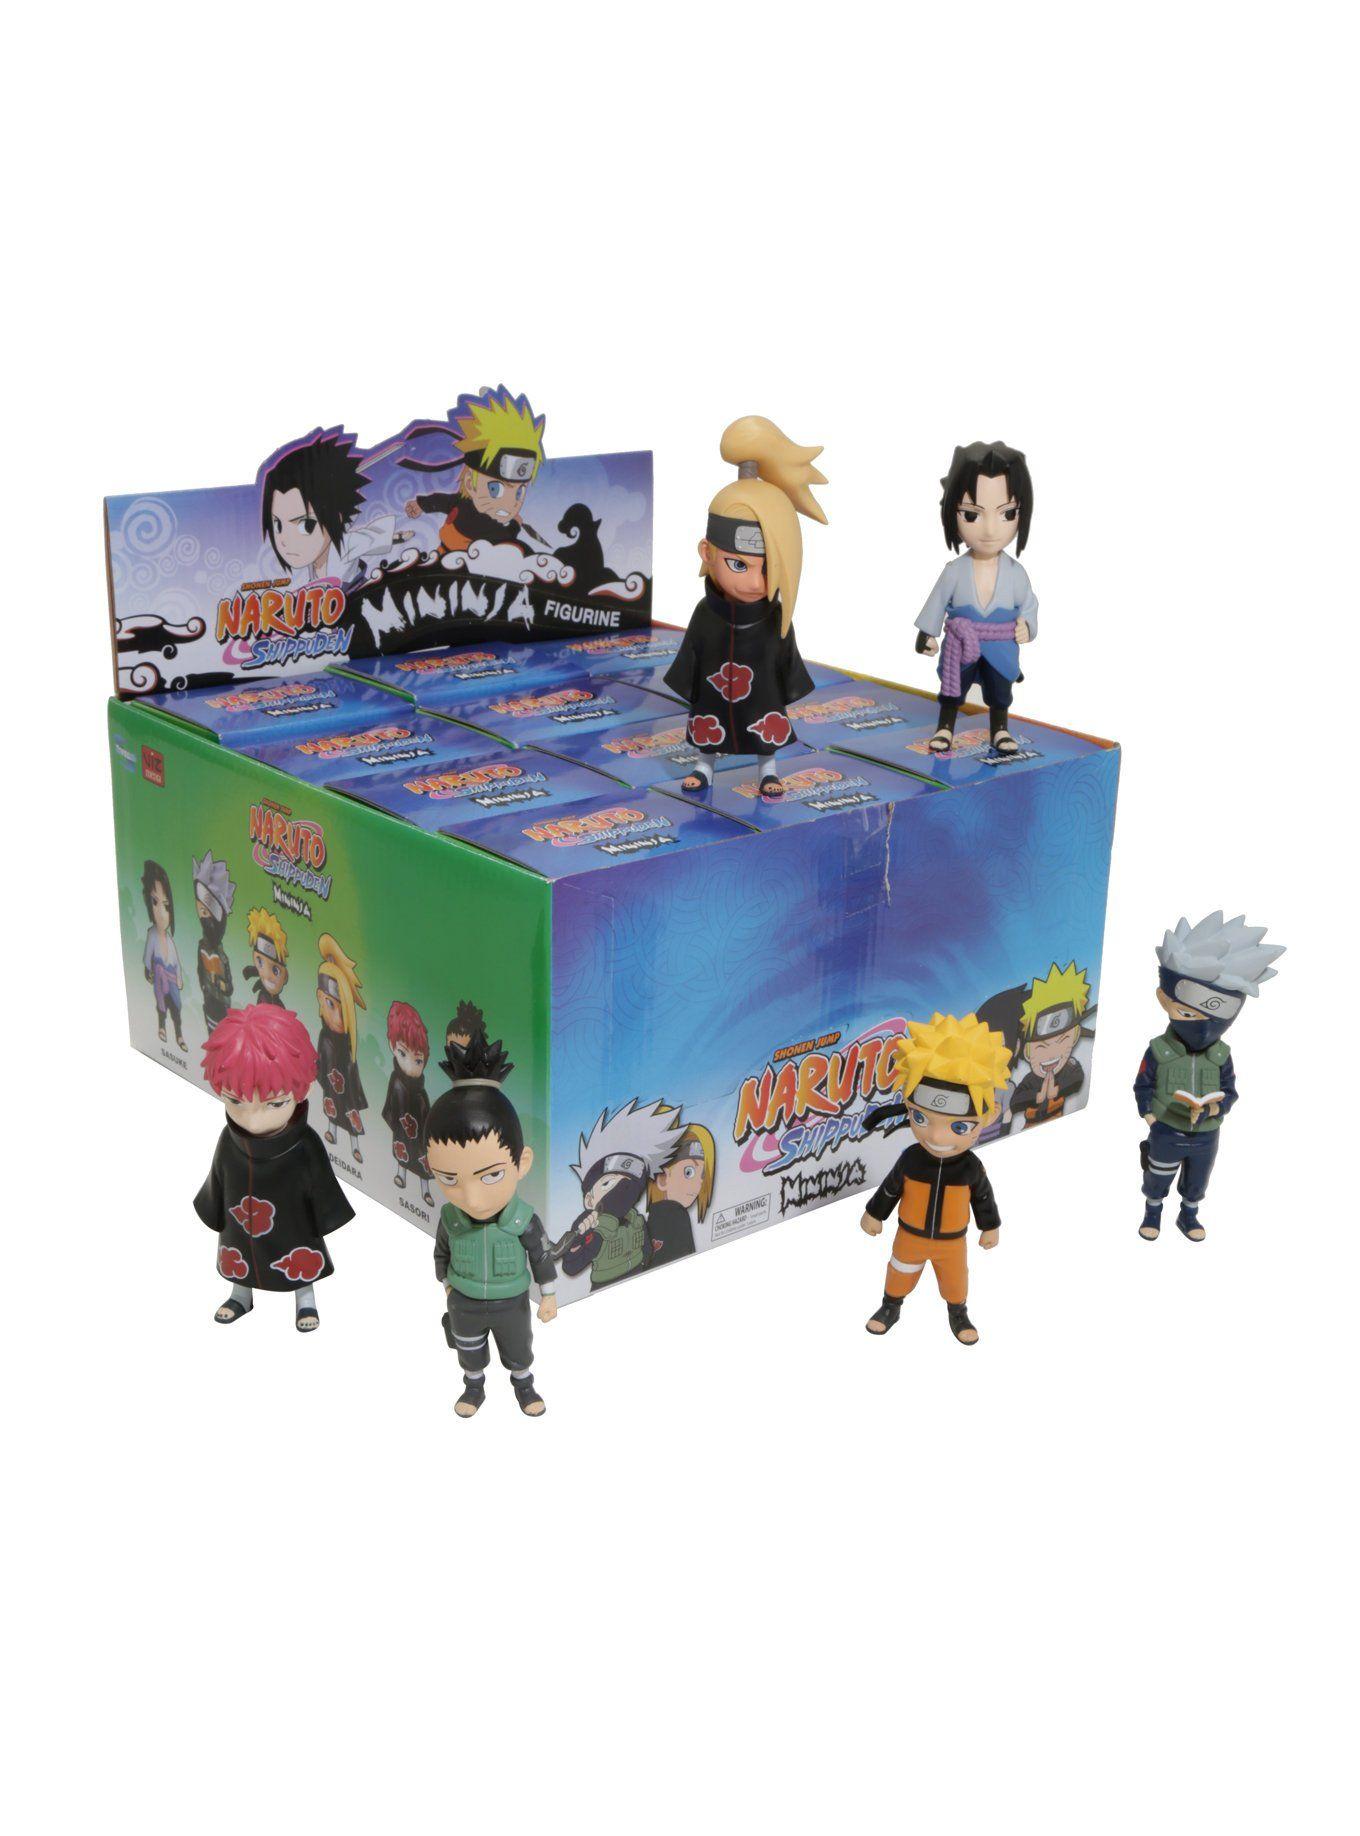 Blind Box Naruto Shippuden Mininja - Toynami